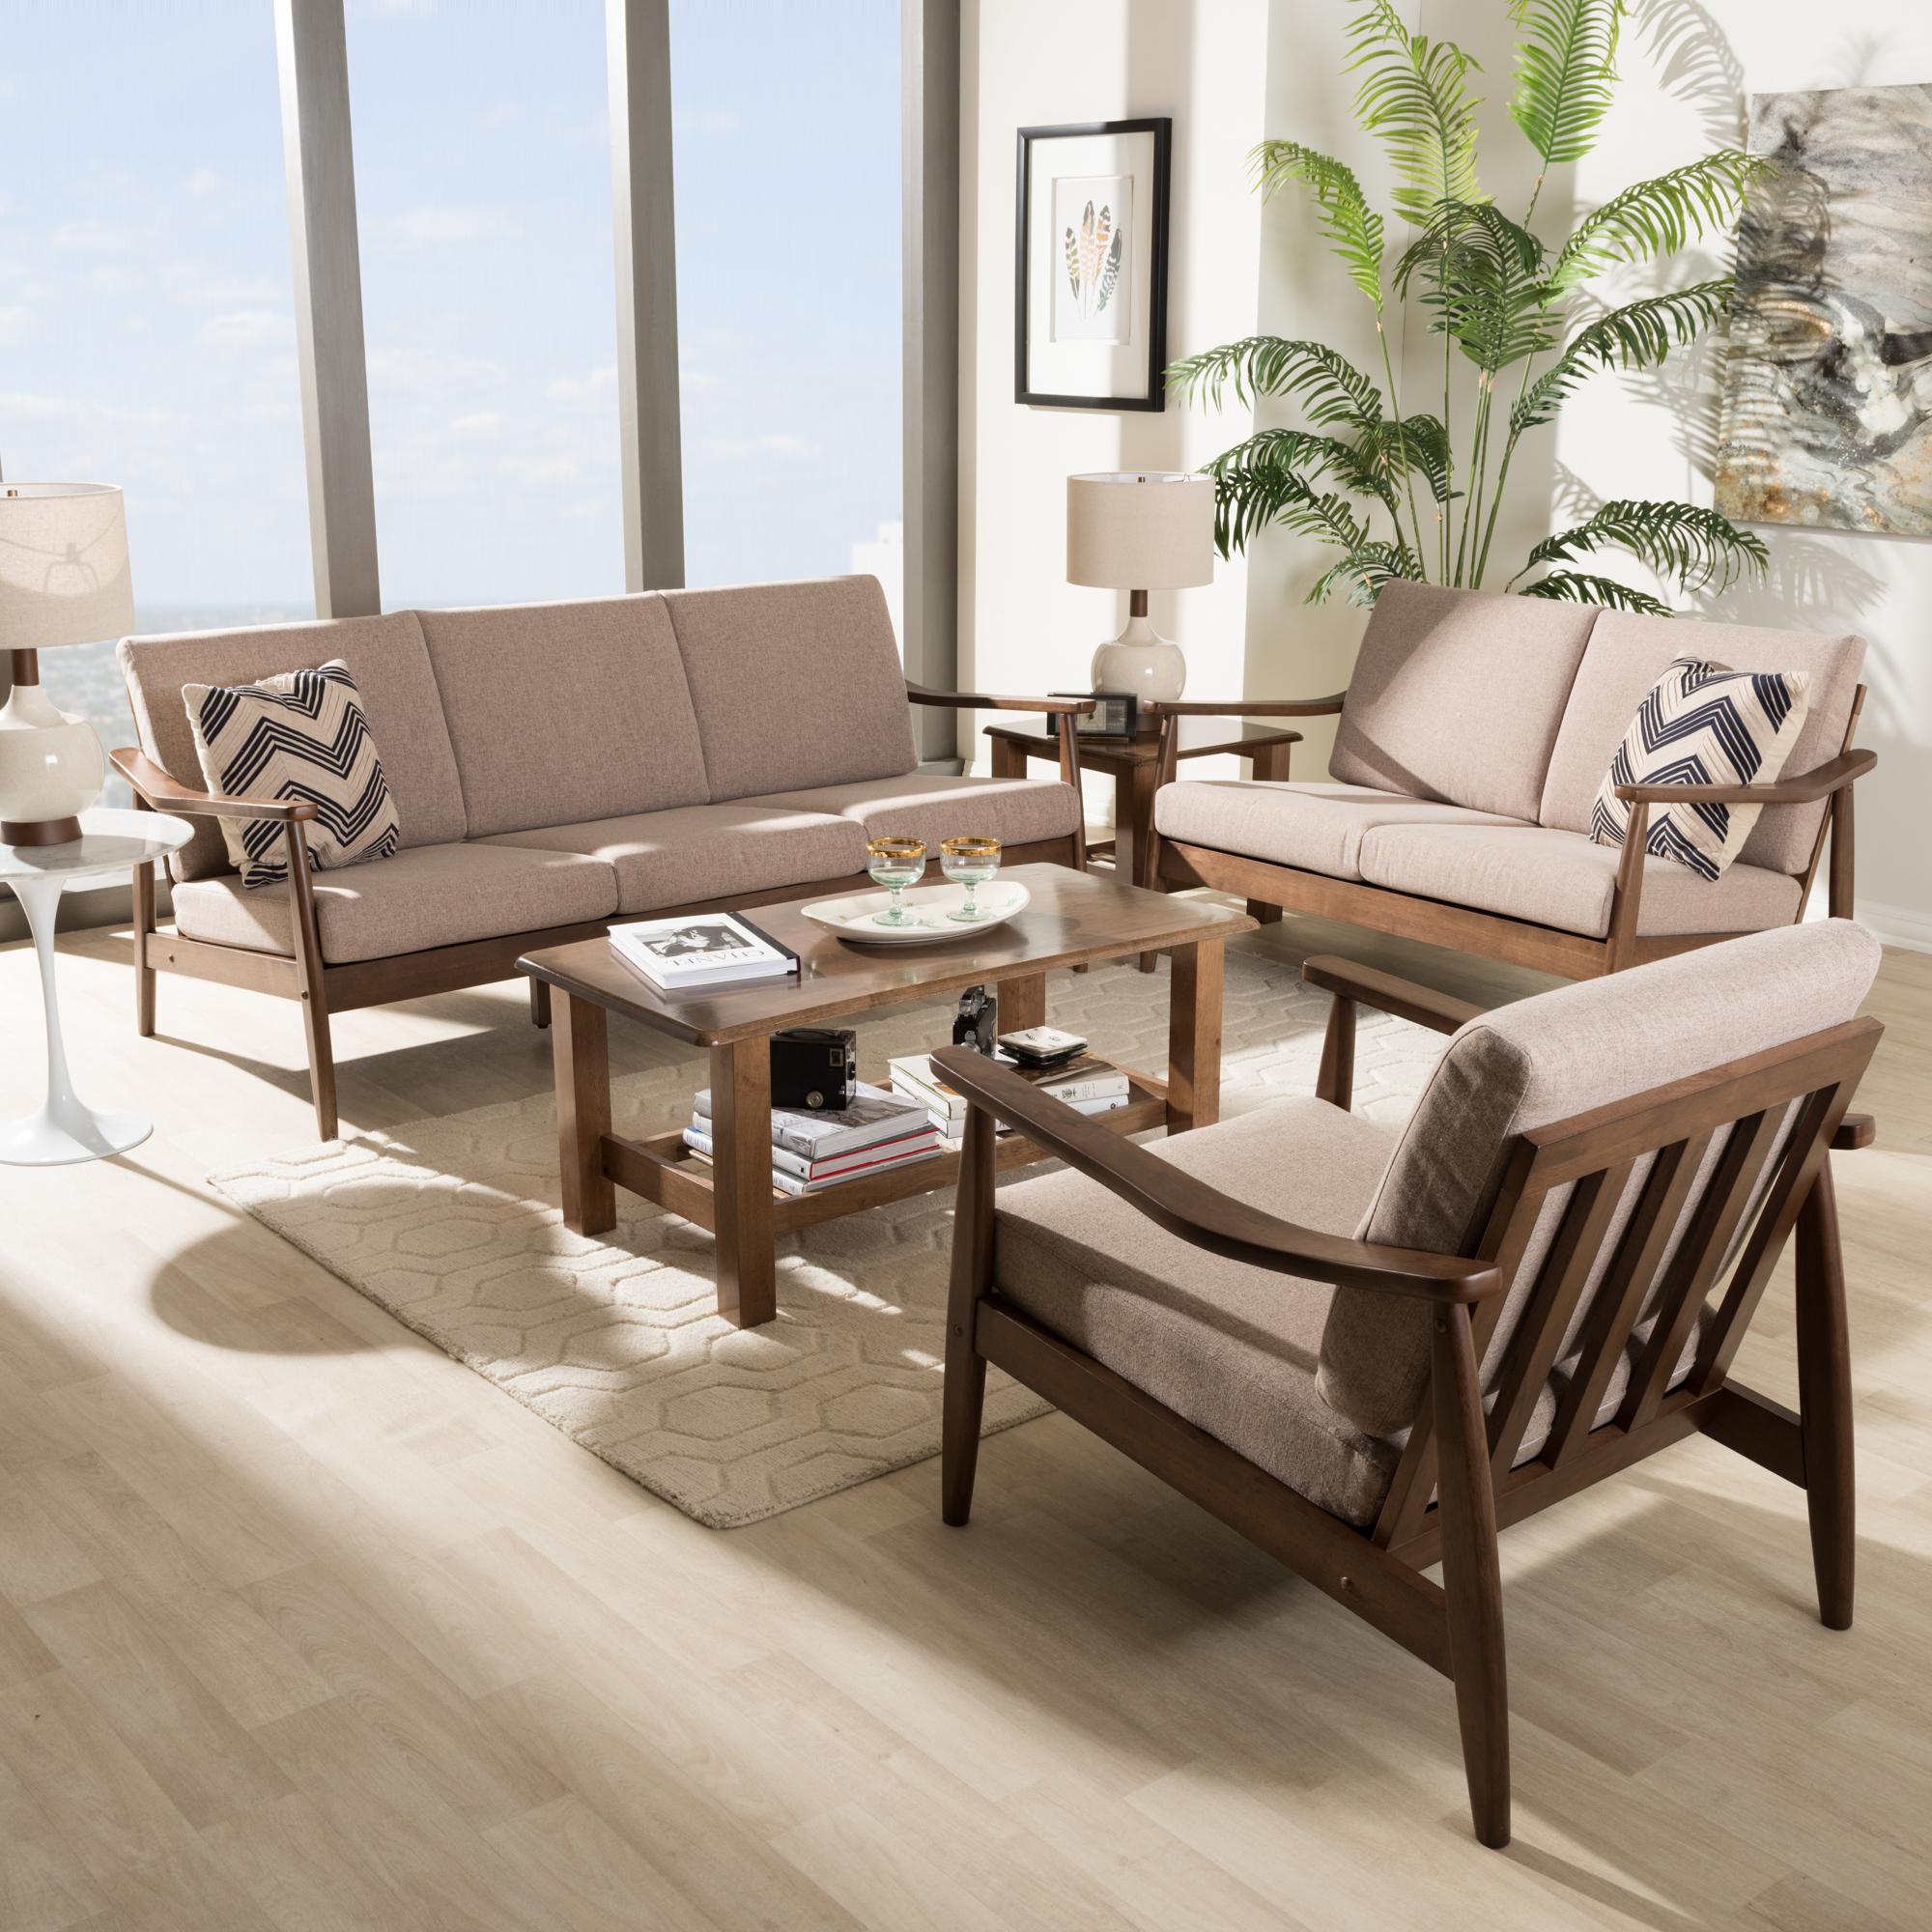 ... Baxton Studio Venza Mid Century Modern Walnut Wood Light Brown Fabric  Upholstered 3 Piece ... Part 63